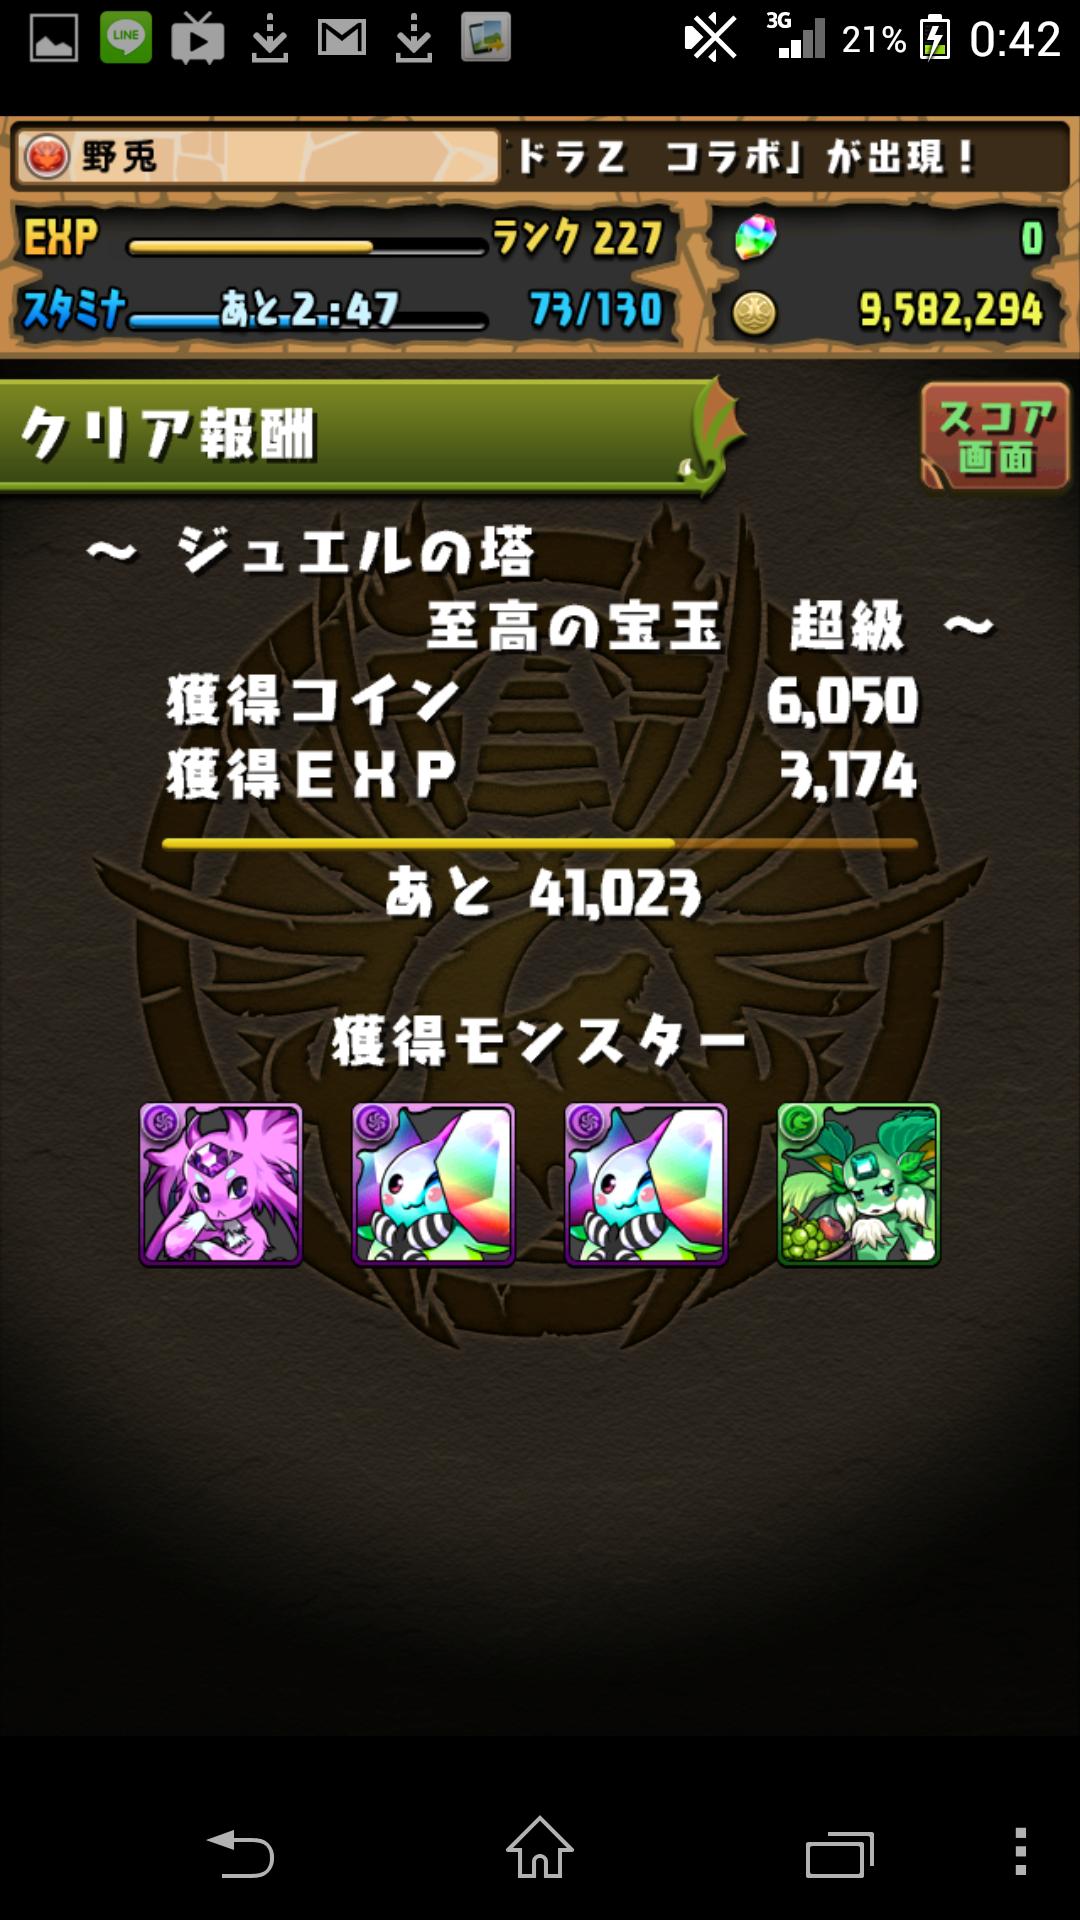 Screenshot_2014-04-16-00-42-38.png